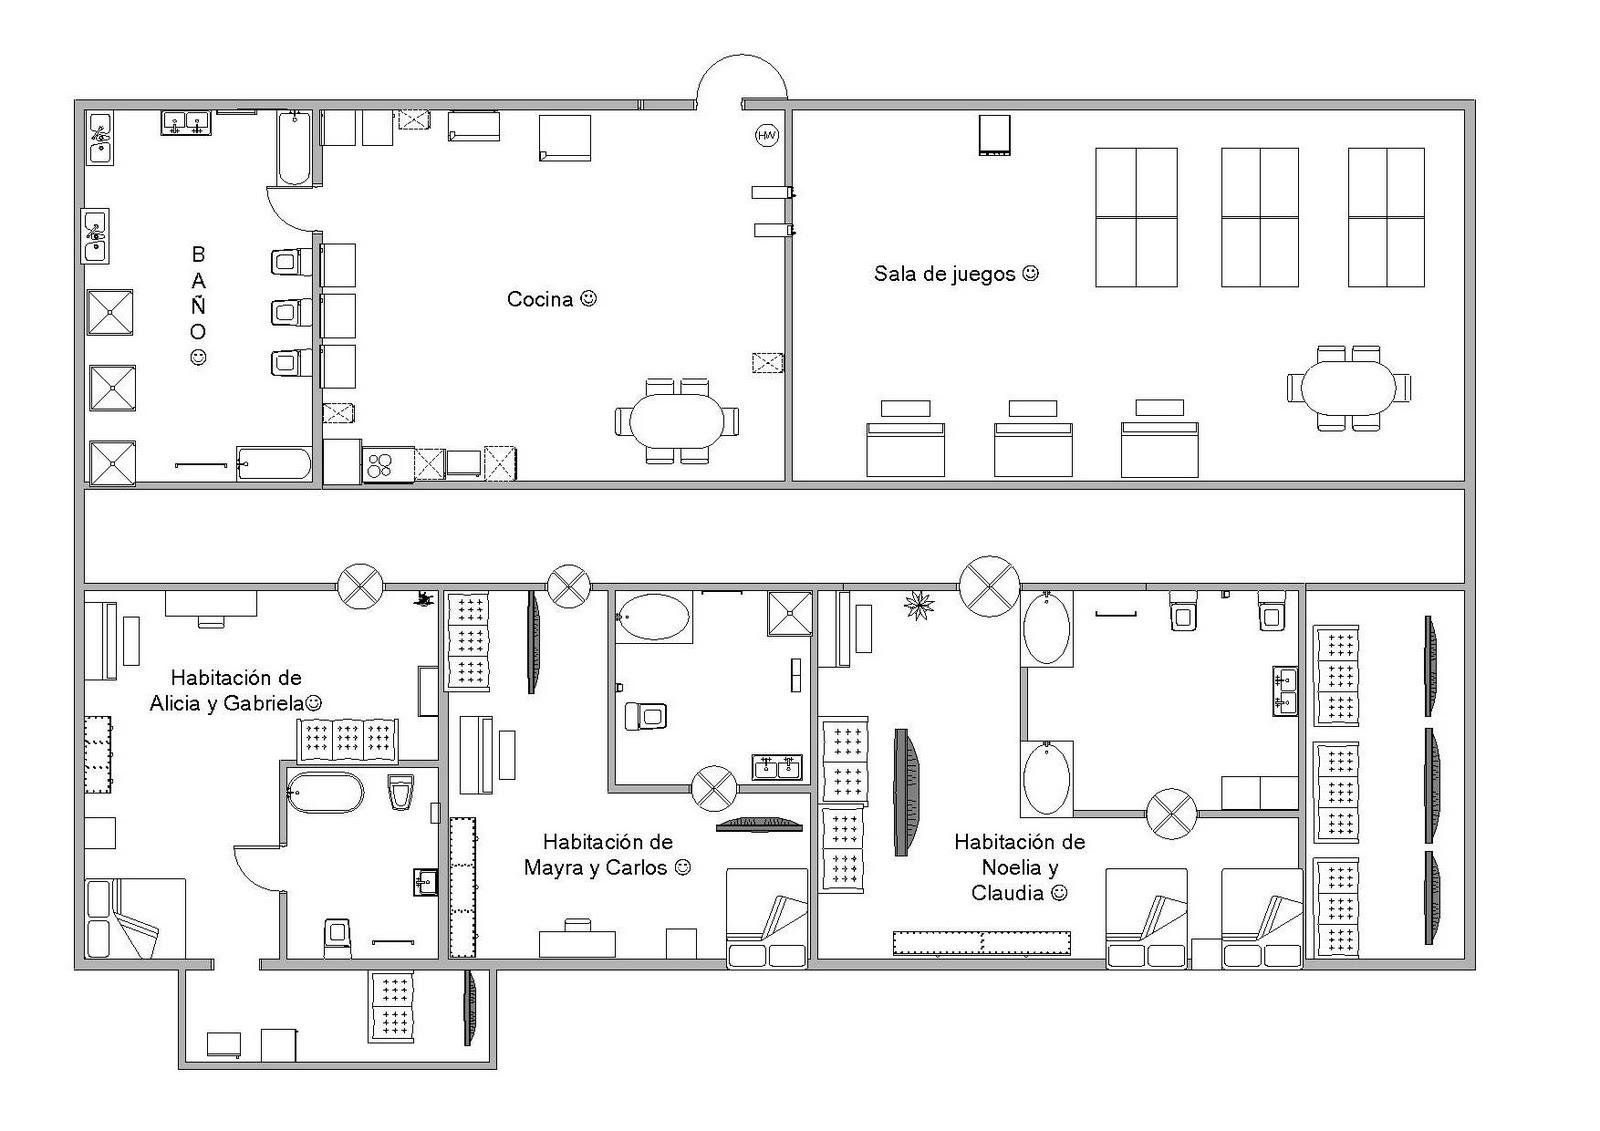 Alternativa a office visio mediavida - Hacer plano de mi casa ...